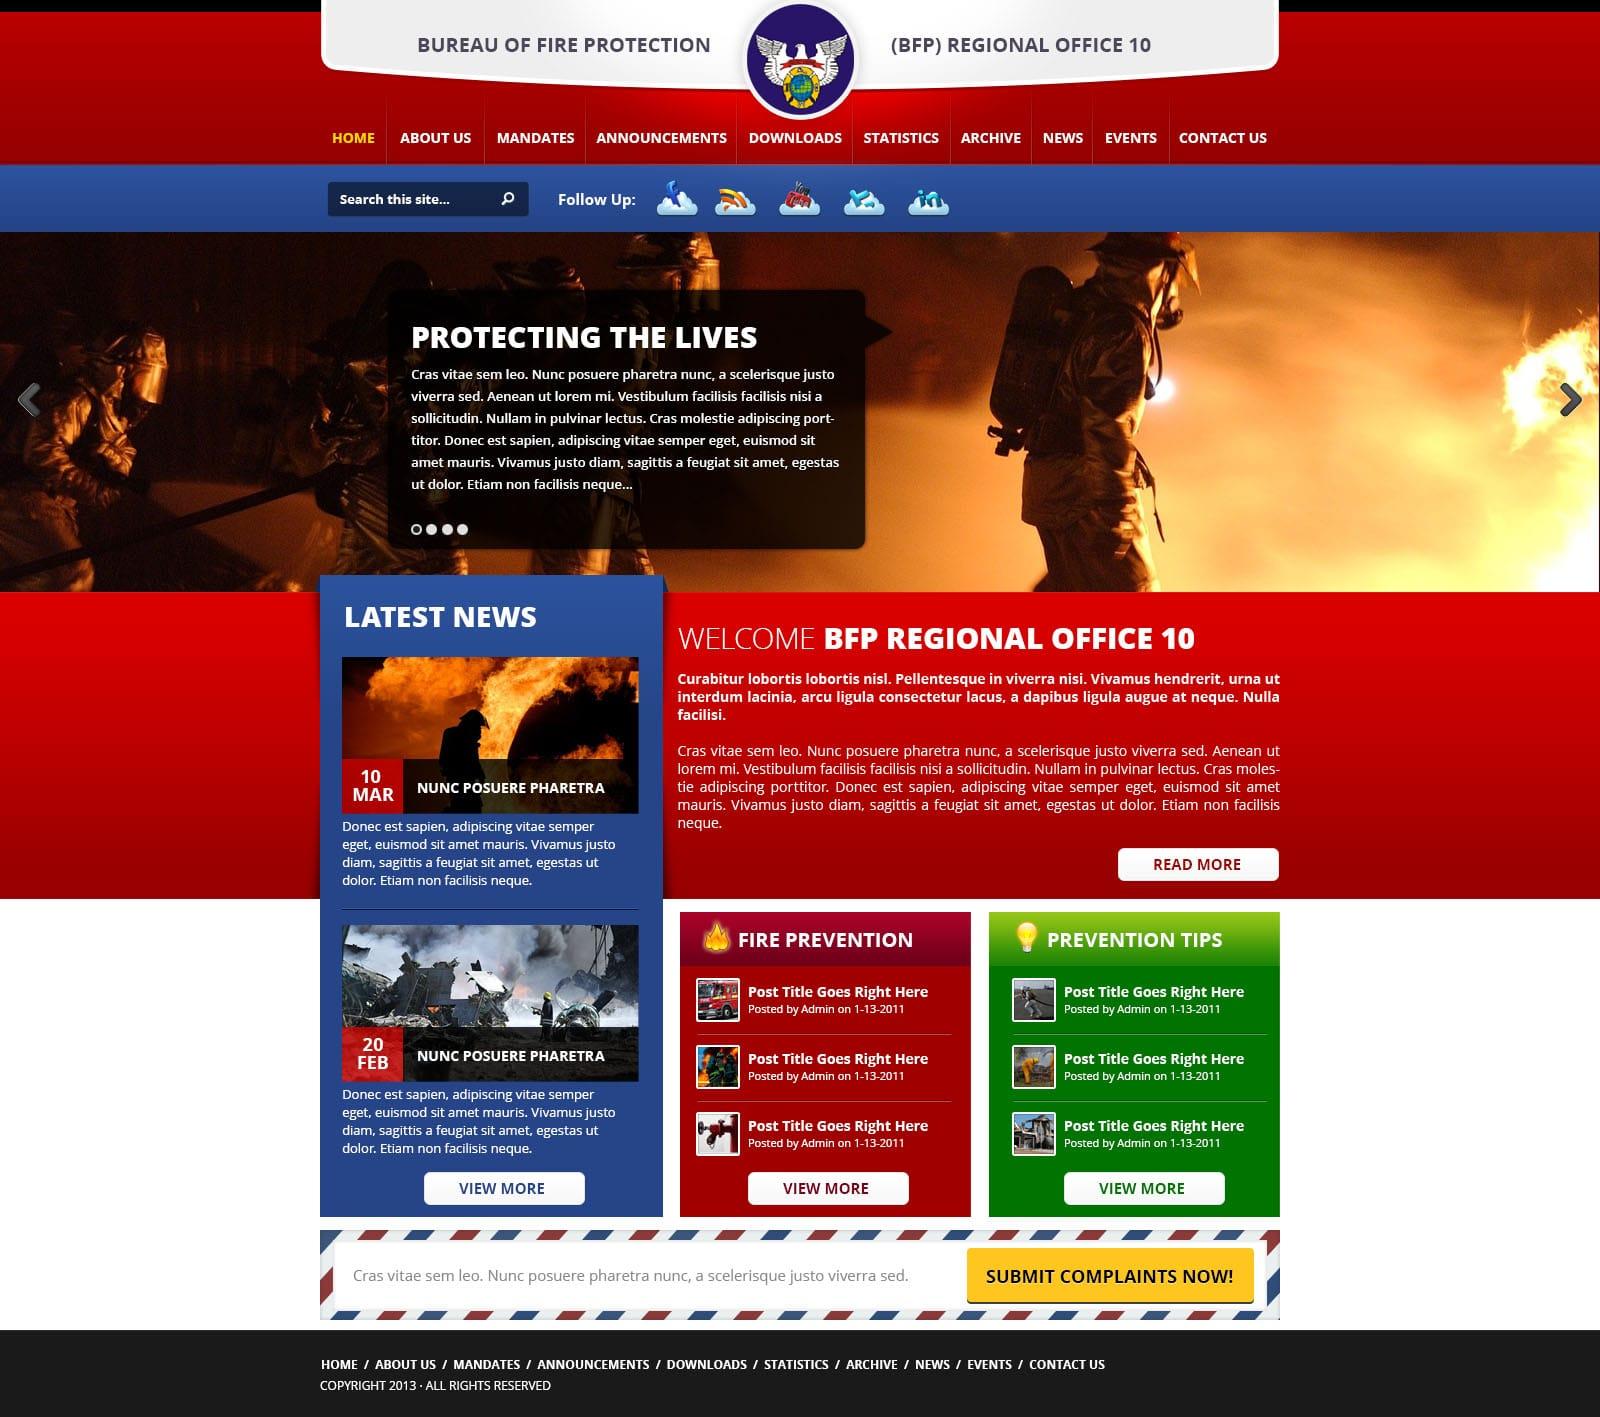 Bureau of Fire Protection Regional Headquarters 10